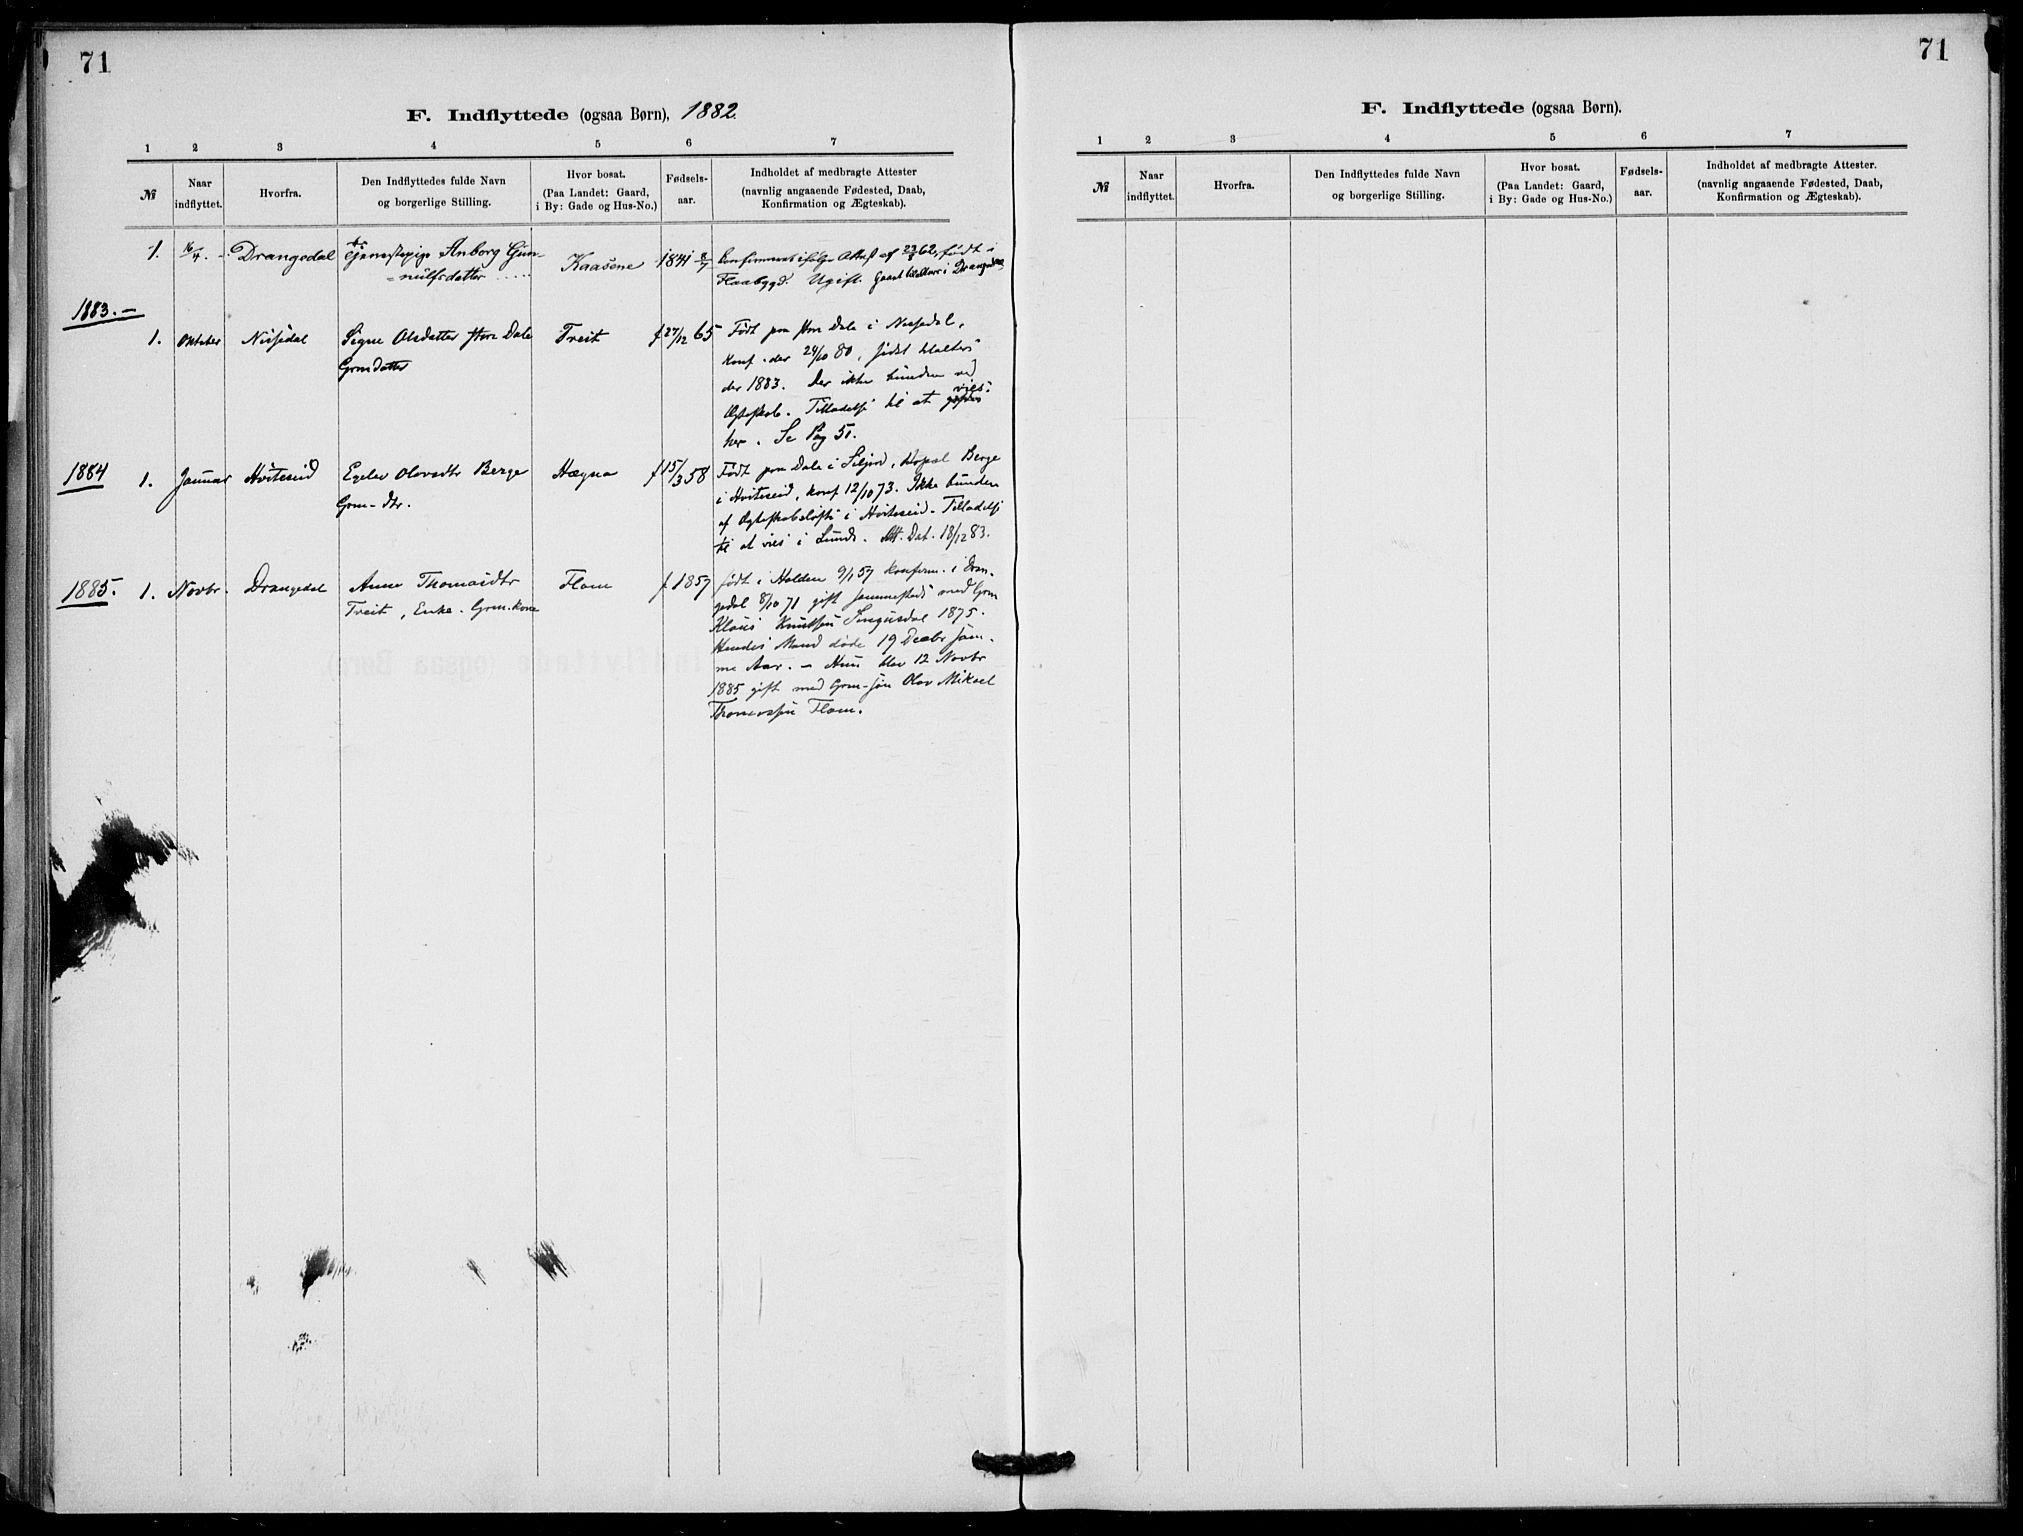 SAKO, Lunde kirkebøker, F/Fb/L0003: Ministerialbok nr. II 3, 1882-1891, s. 71